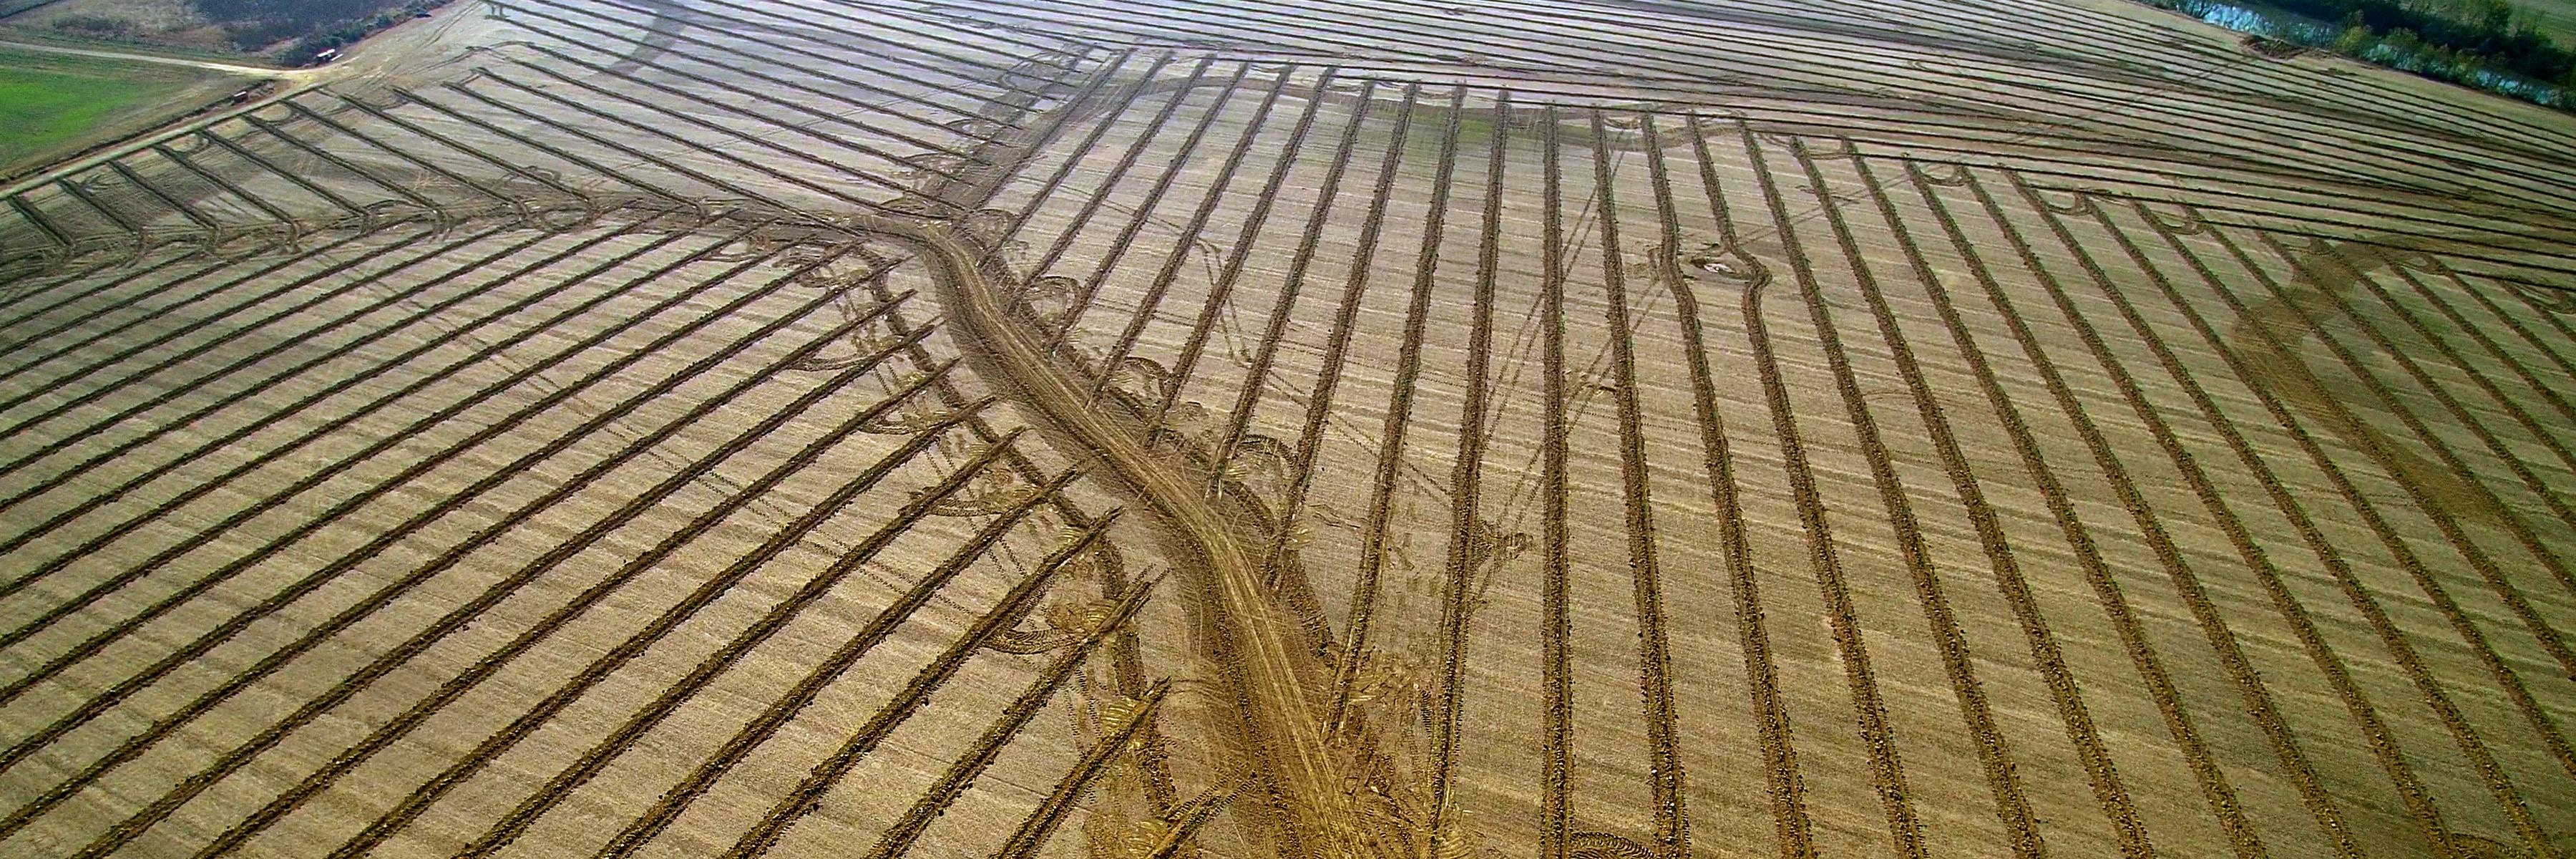 hayden tiling owensboro ky farm